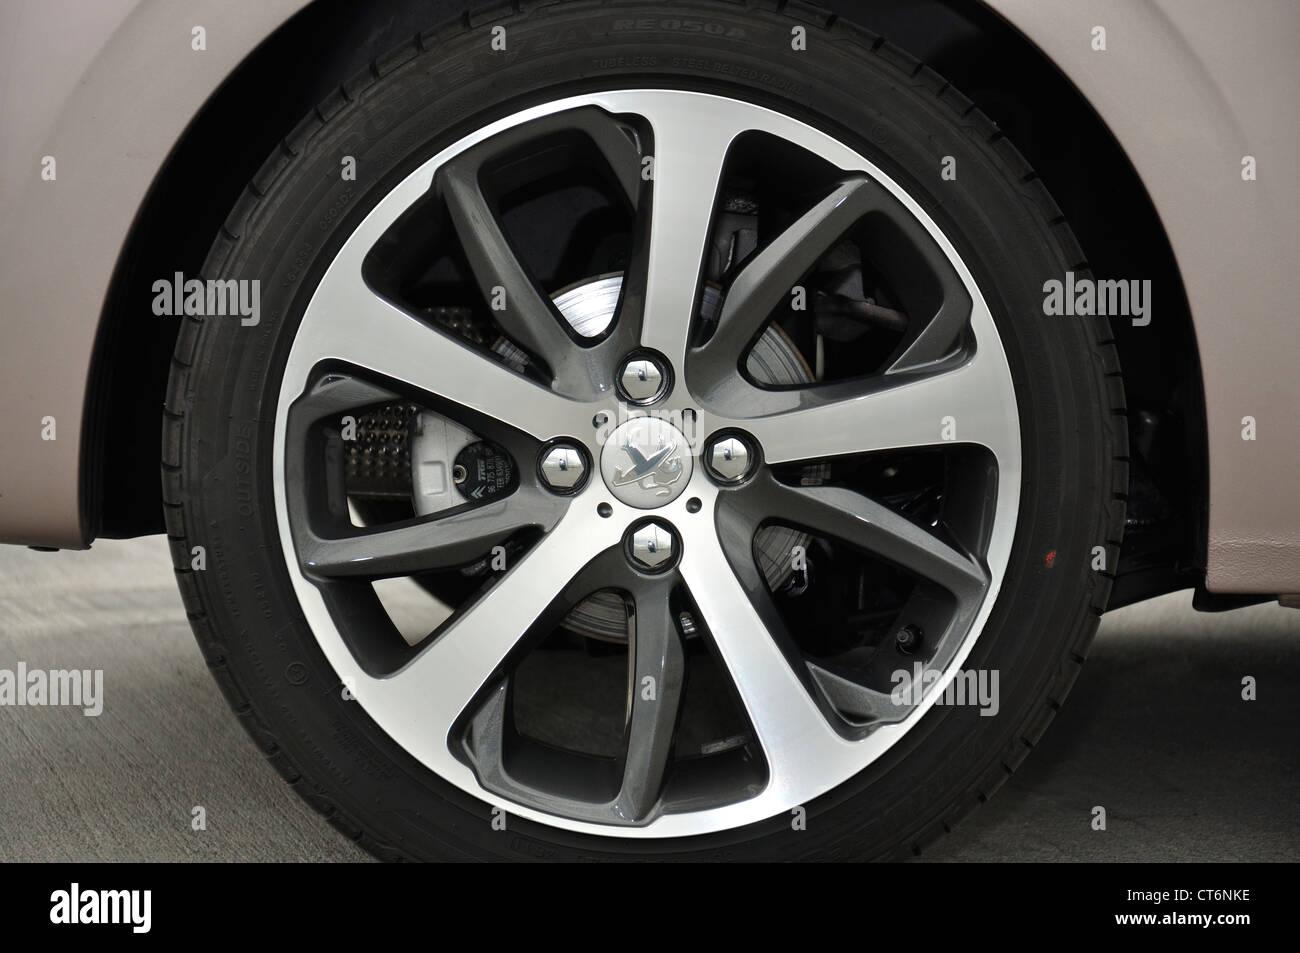 Peugeot 208, Auto-Rad Stockfoto